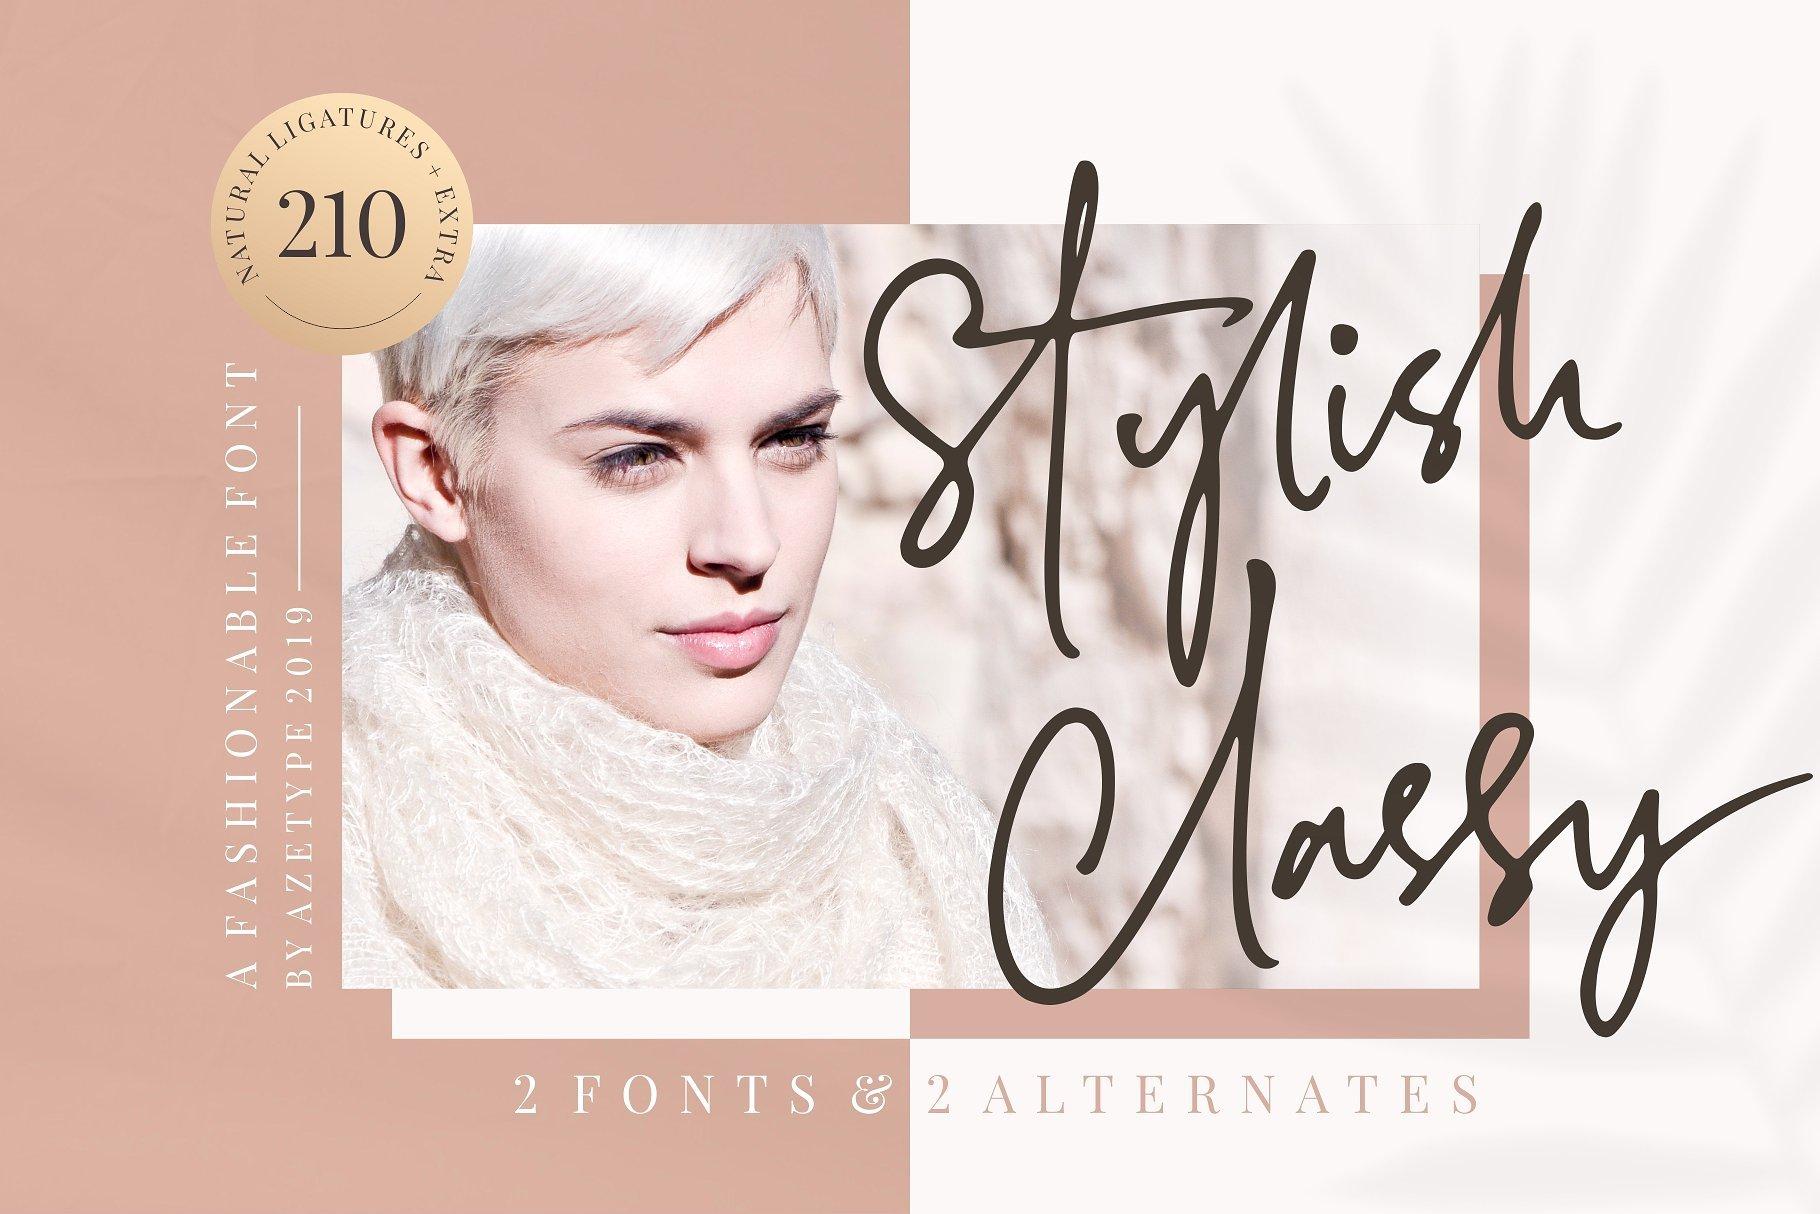 https://fontclarity.com/wp-content/uploads/2019/09/stylish-classy-script-font-download-0.jpg Free Download